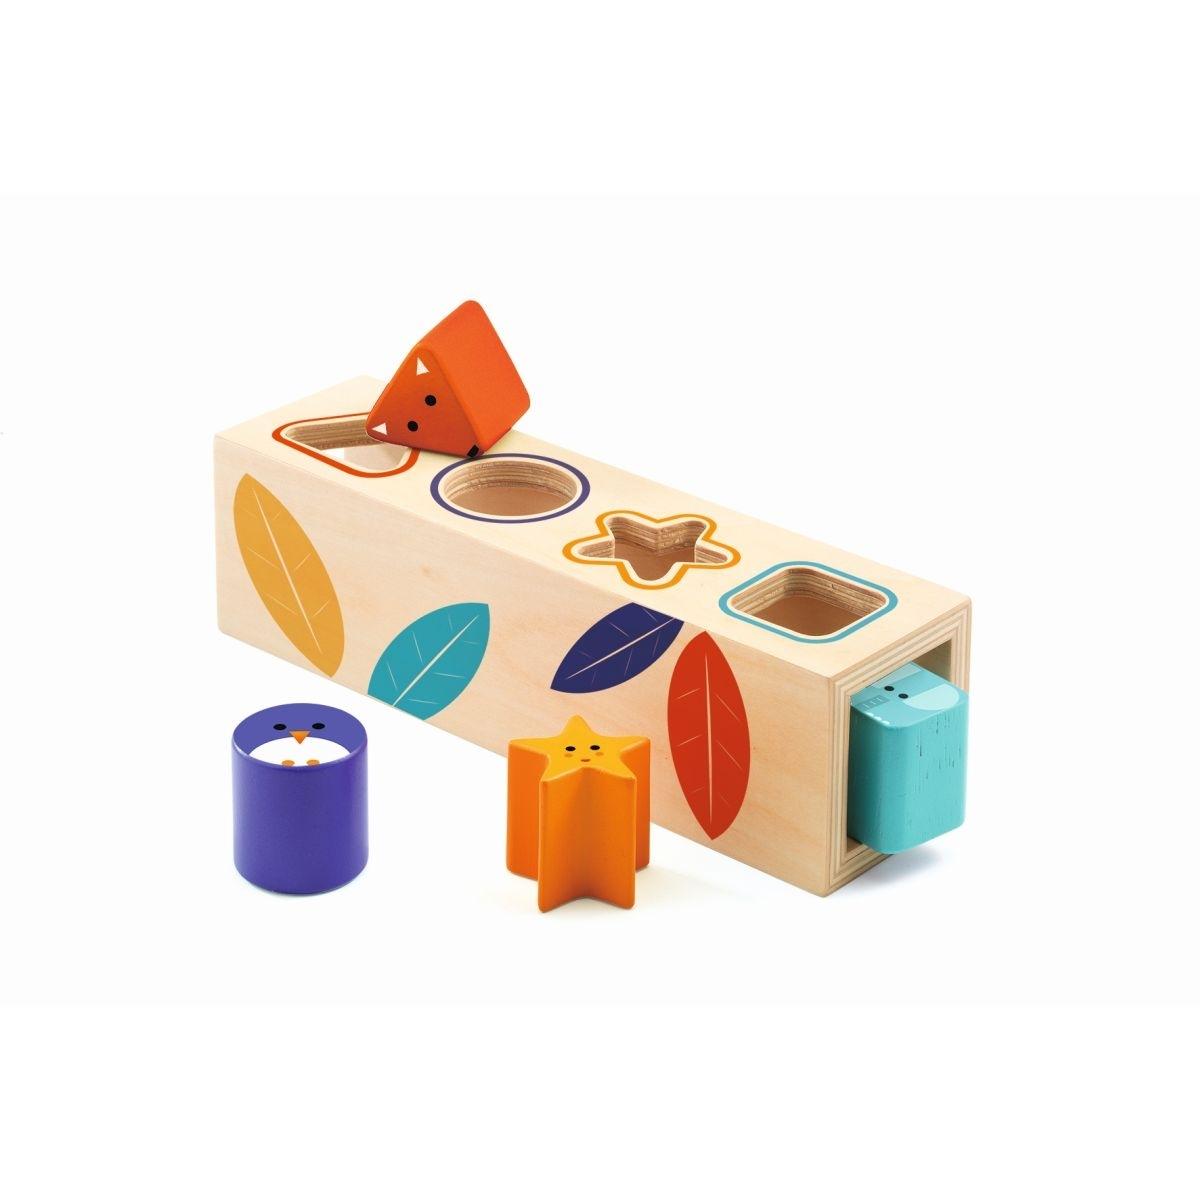 djeco babyspielzeug djeco lieblingsmarken spielzeug geschenke f r jung alt bei. Black Bedroom Furniture Sets. Home Design Ideas